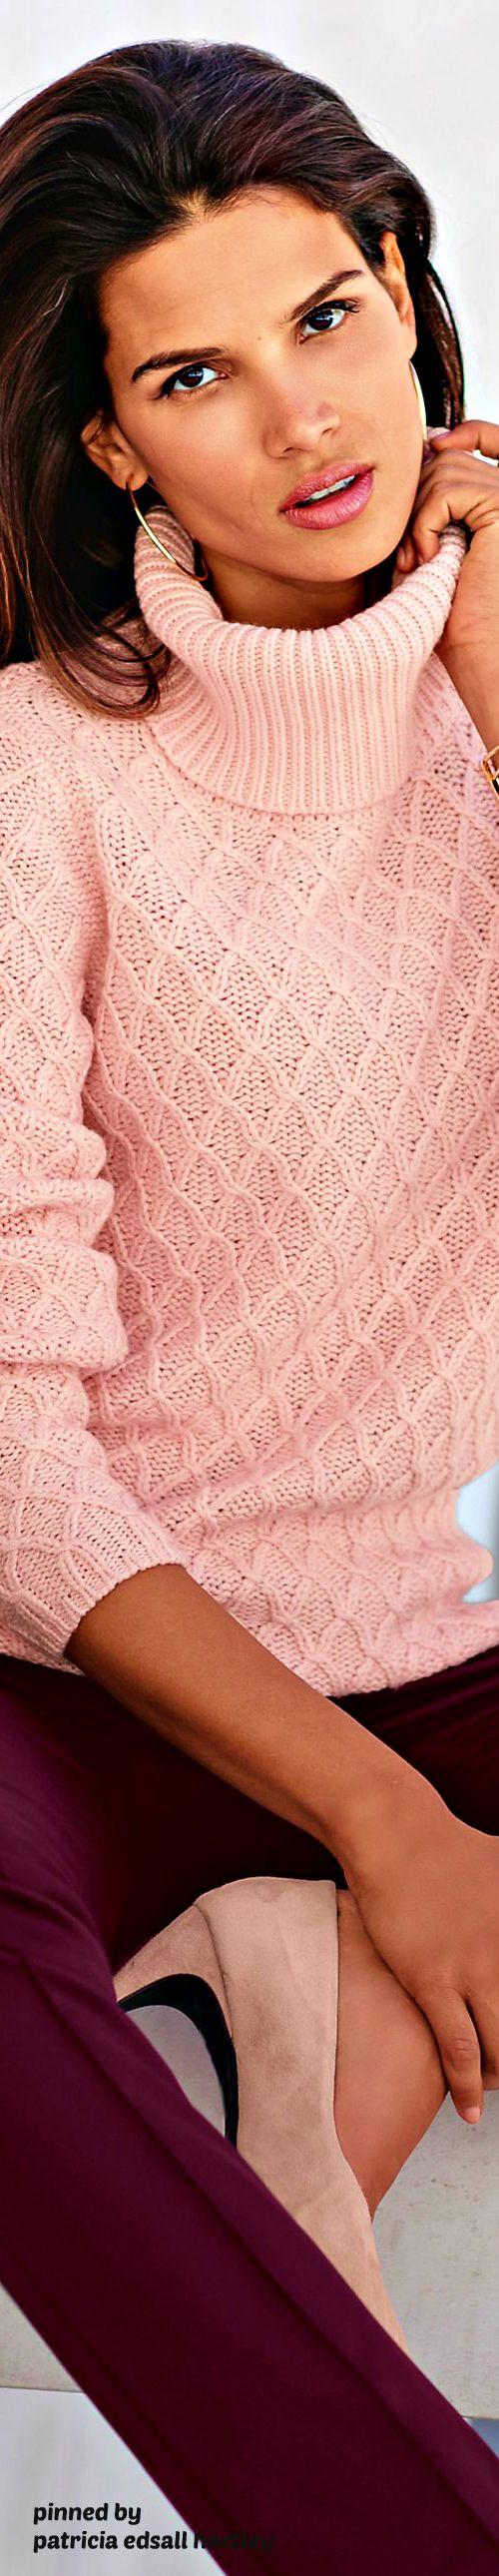 Madeleine sweater. #sweaters #knits